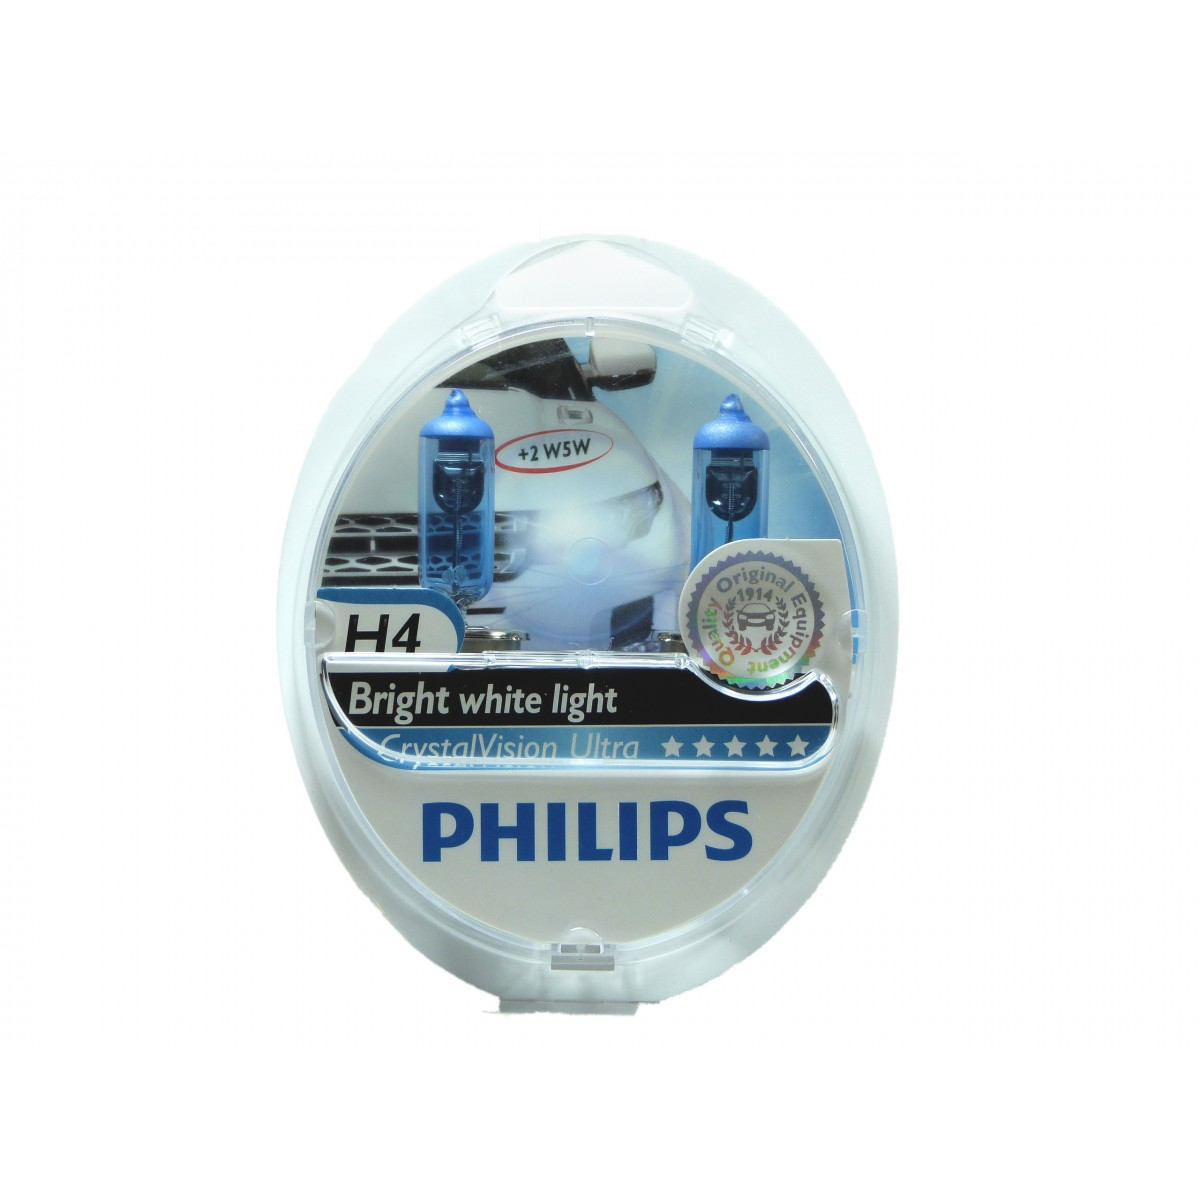 Kit Lampadas Philips Crystal Vision H4 Super Branca